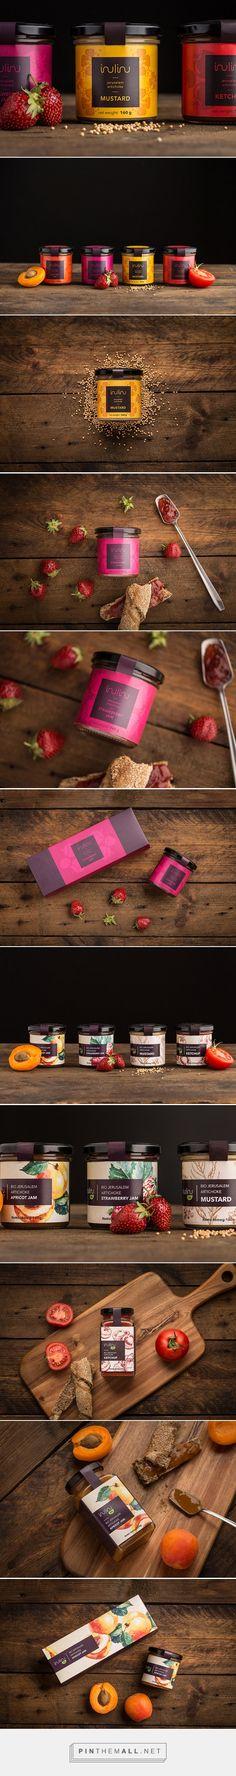 INULINU - mustards, ketchups and jams / design by DekoRatio Branding & Design Studio, Flora Seres, Ágnes Beke